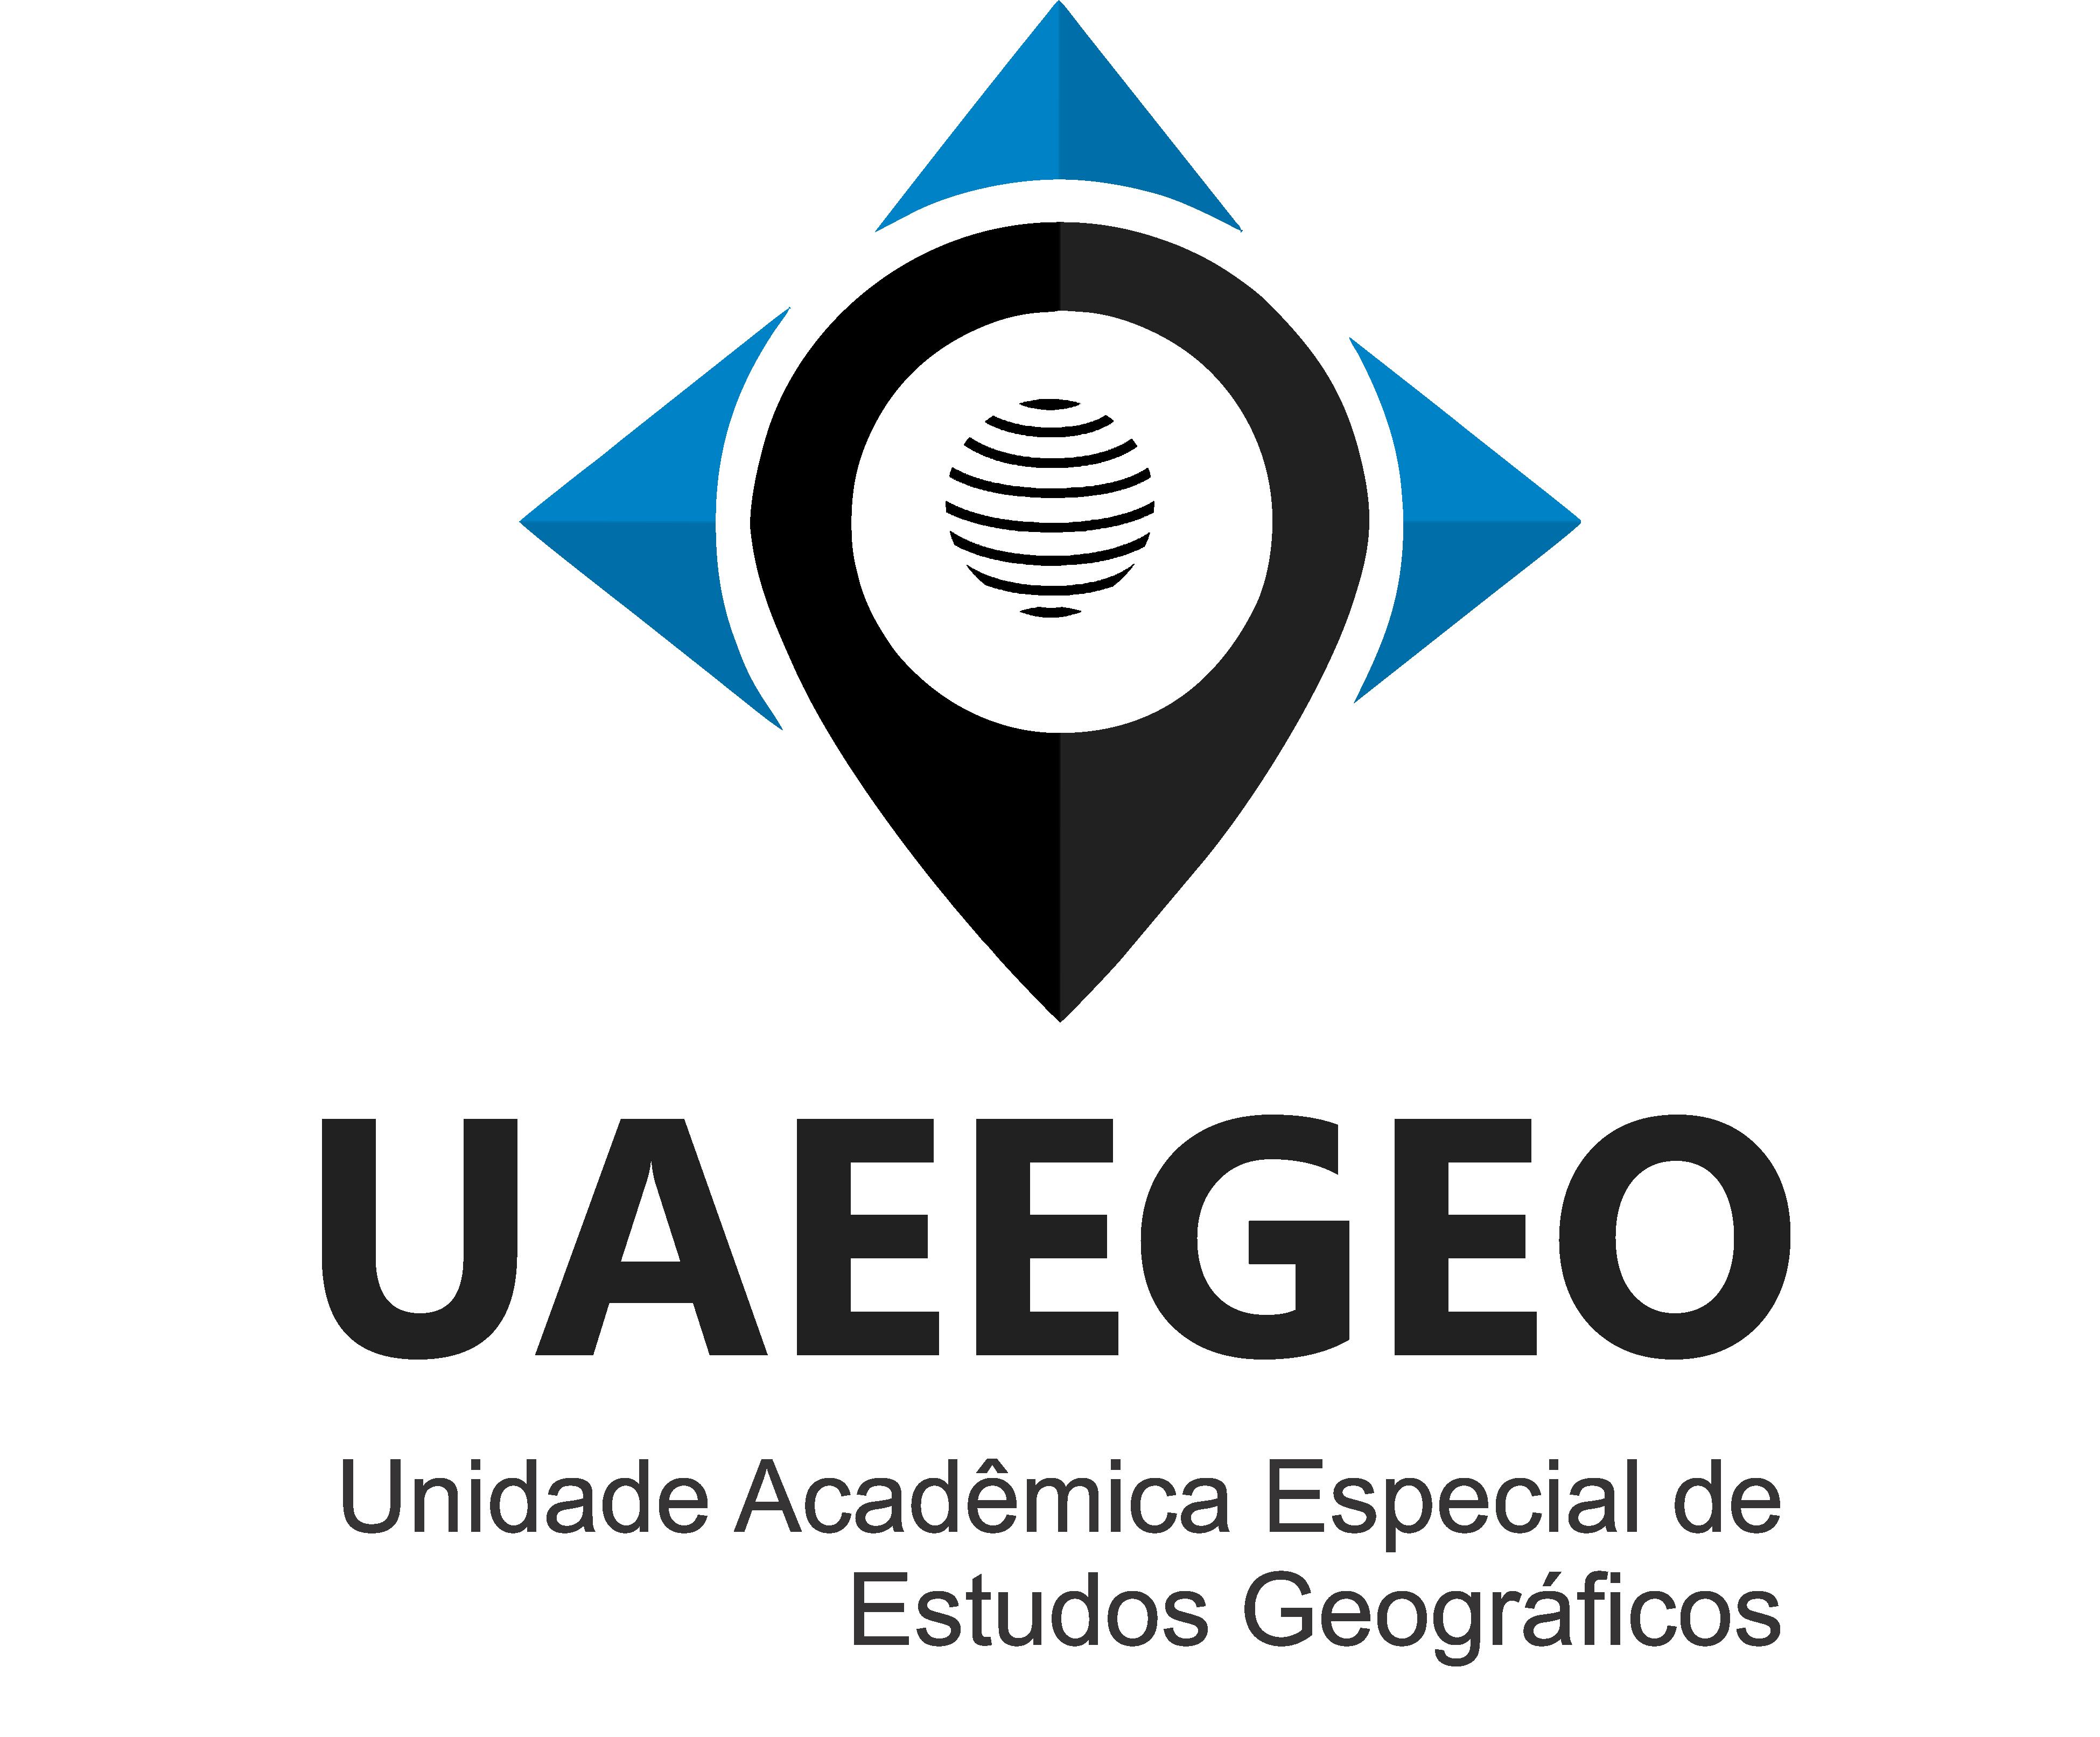 Unidade Academica de Estudos Geográficos